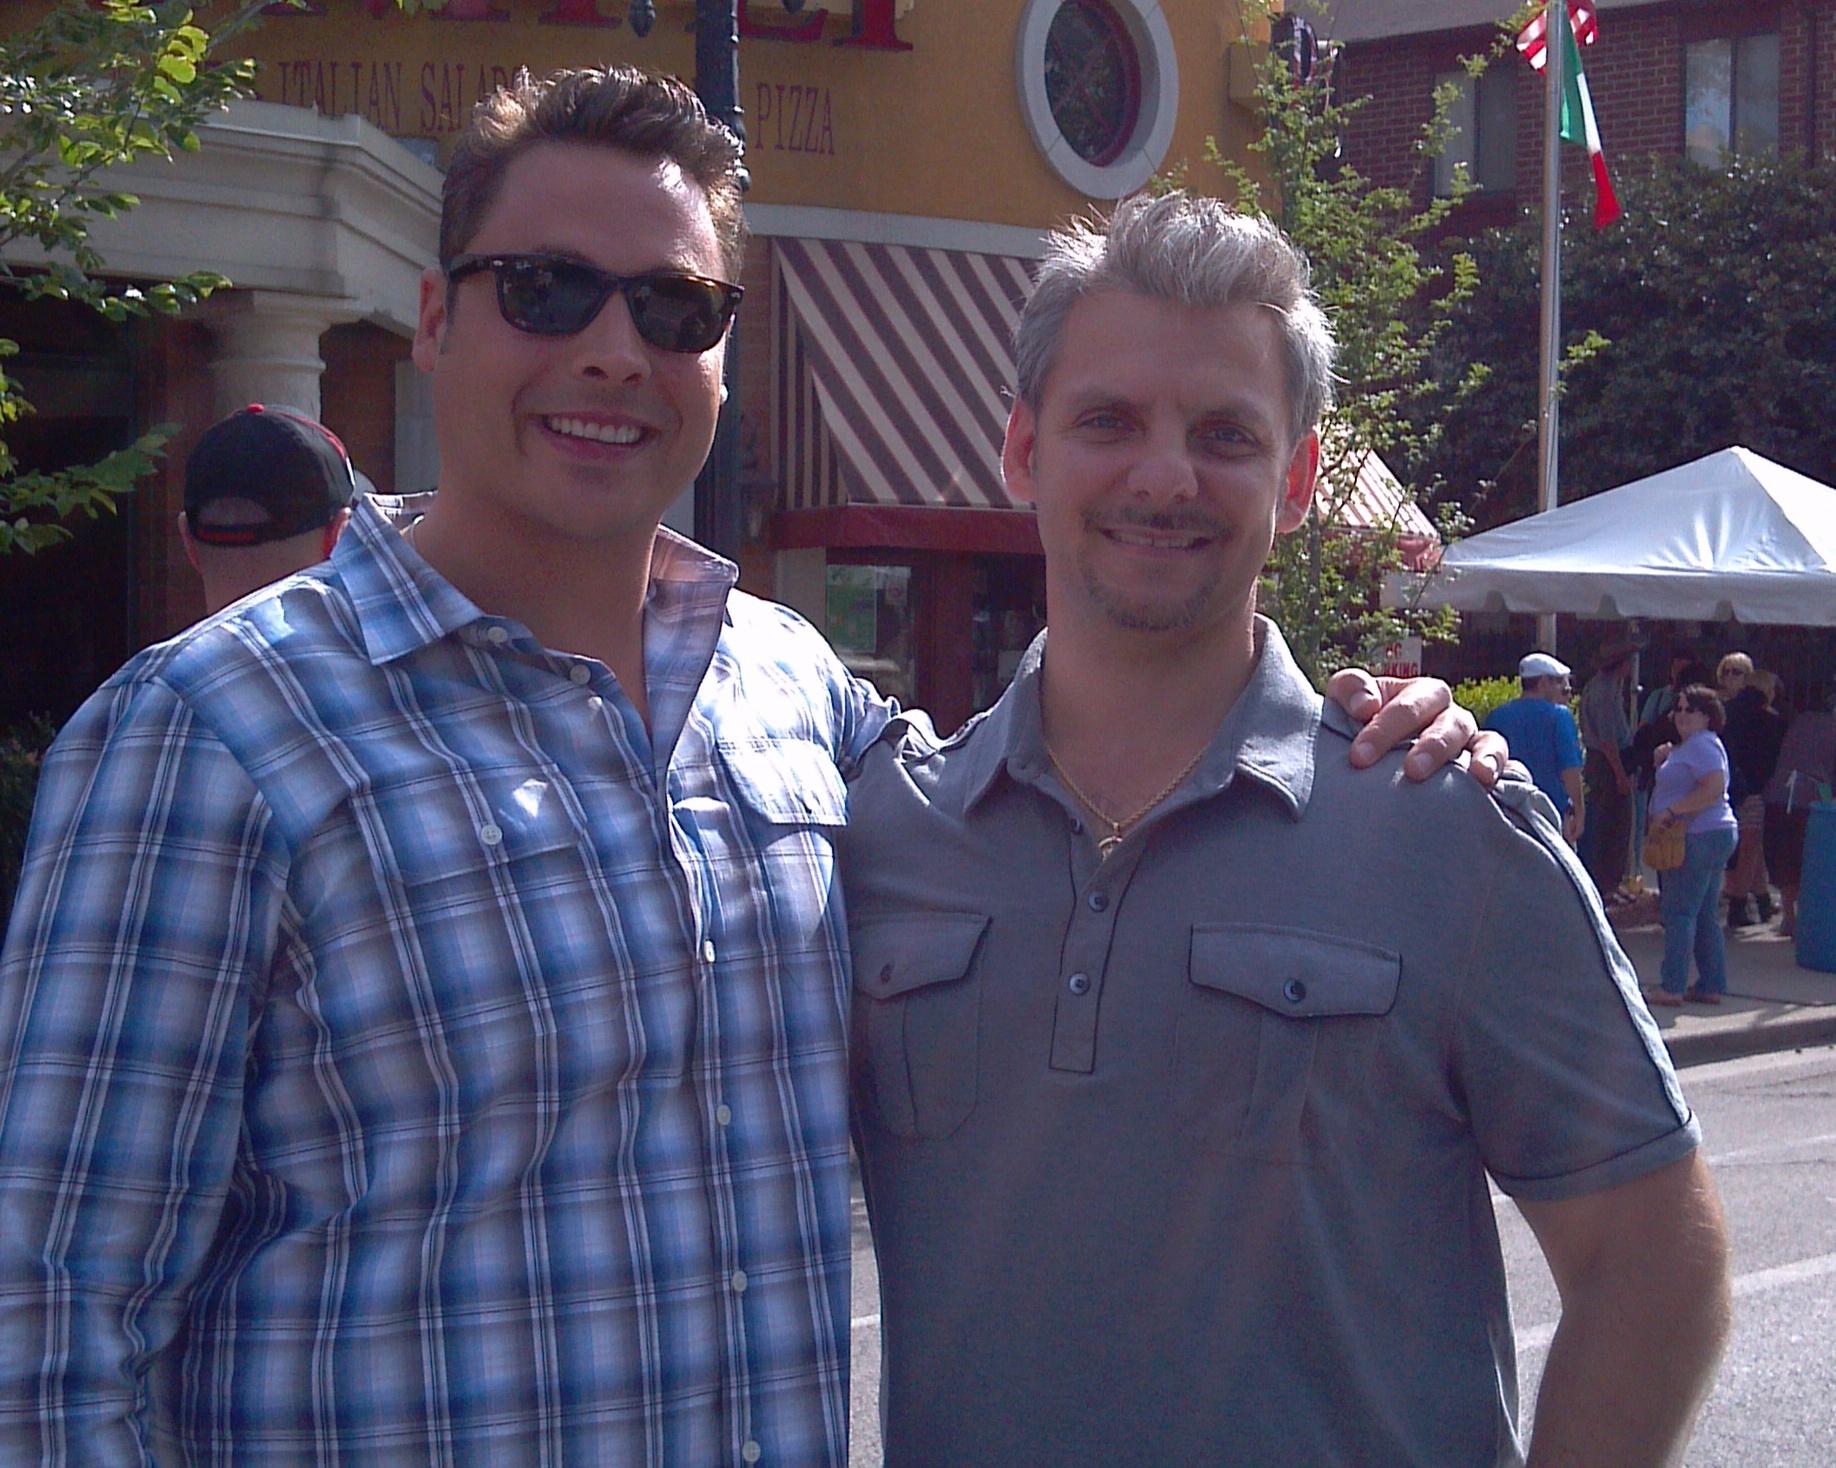 Jeff+Mauro.jpg